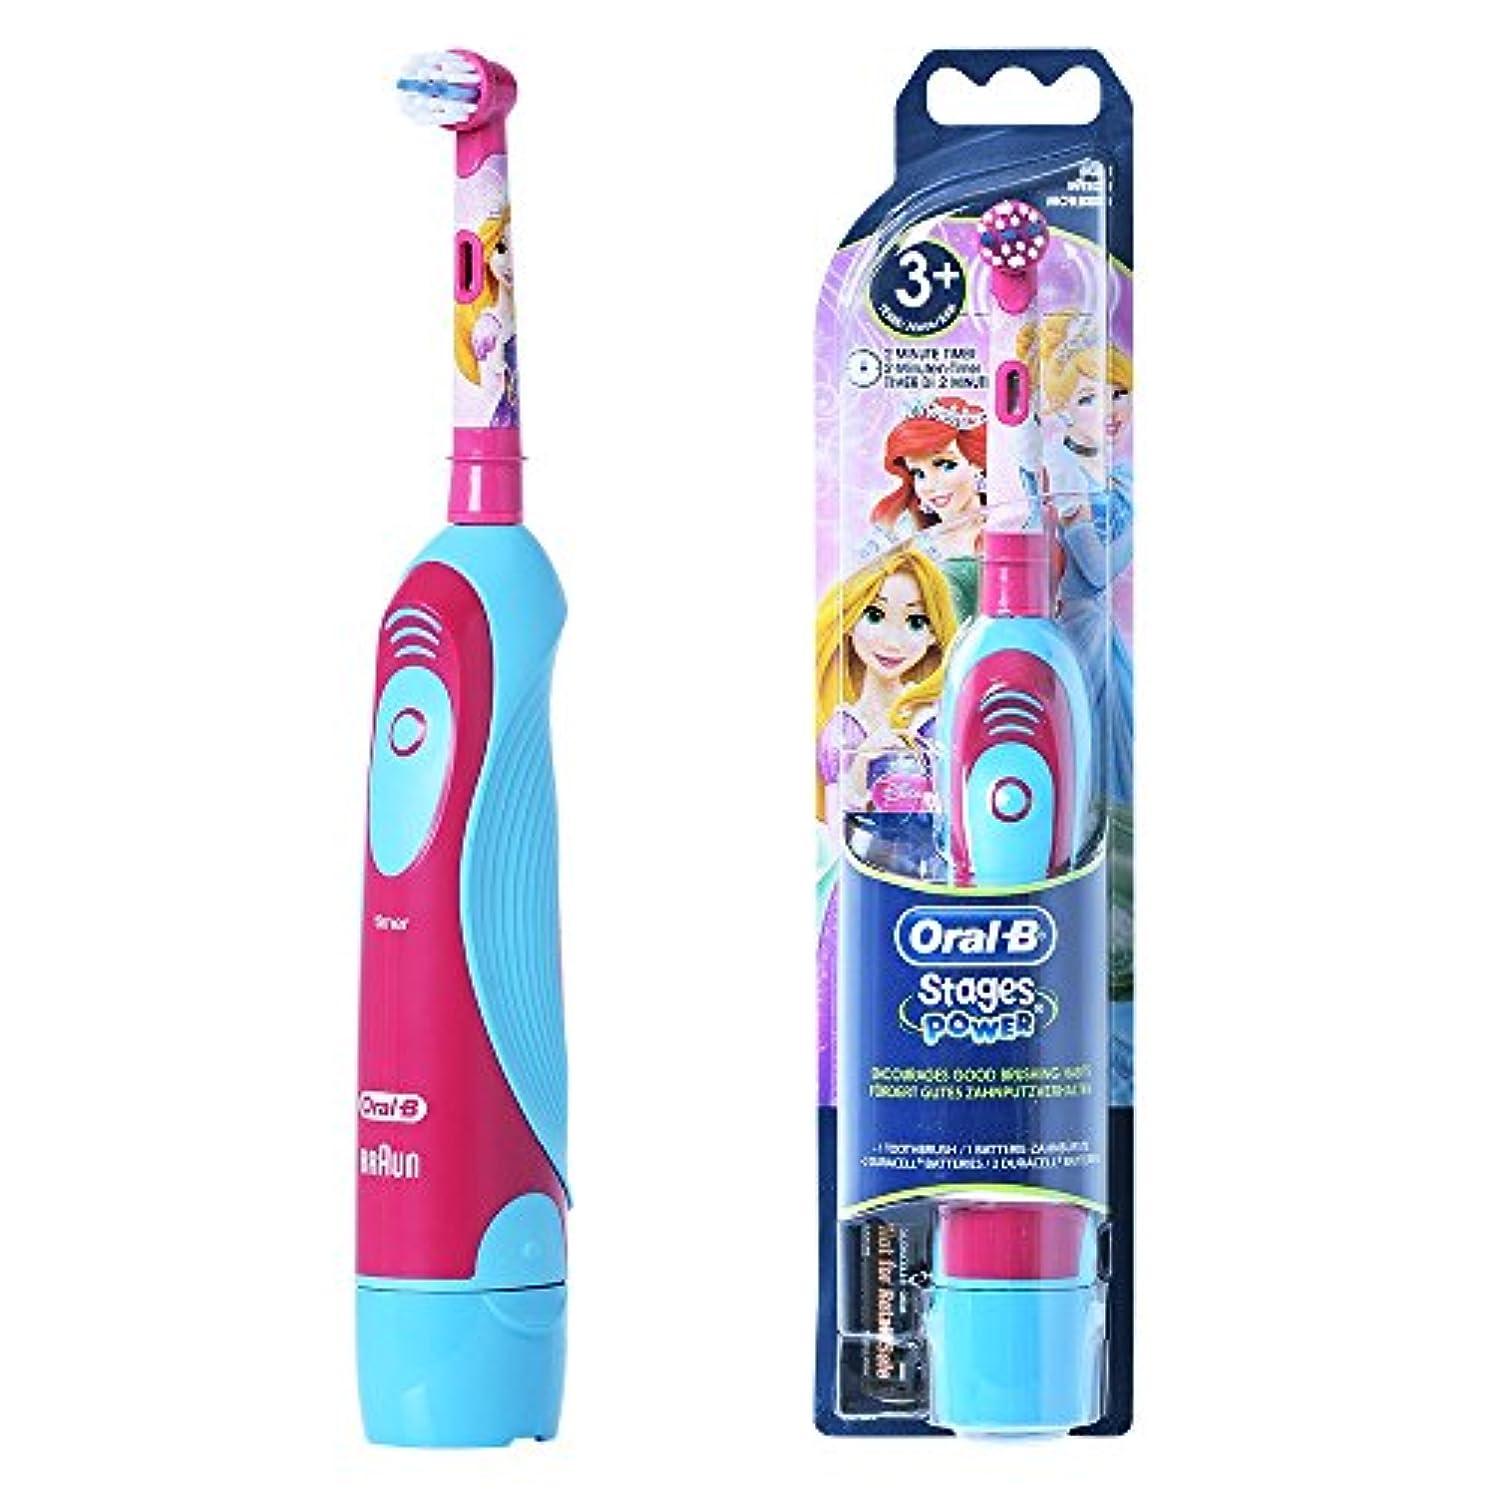 大通り人事戦略Braun Oral-B D2 D2010 Disney Princess Kids 電動歯ブラシ [並行輸入品]